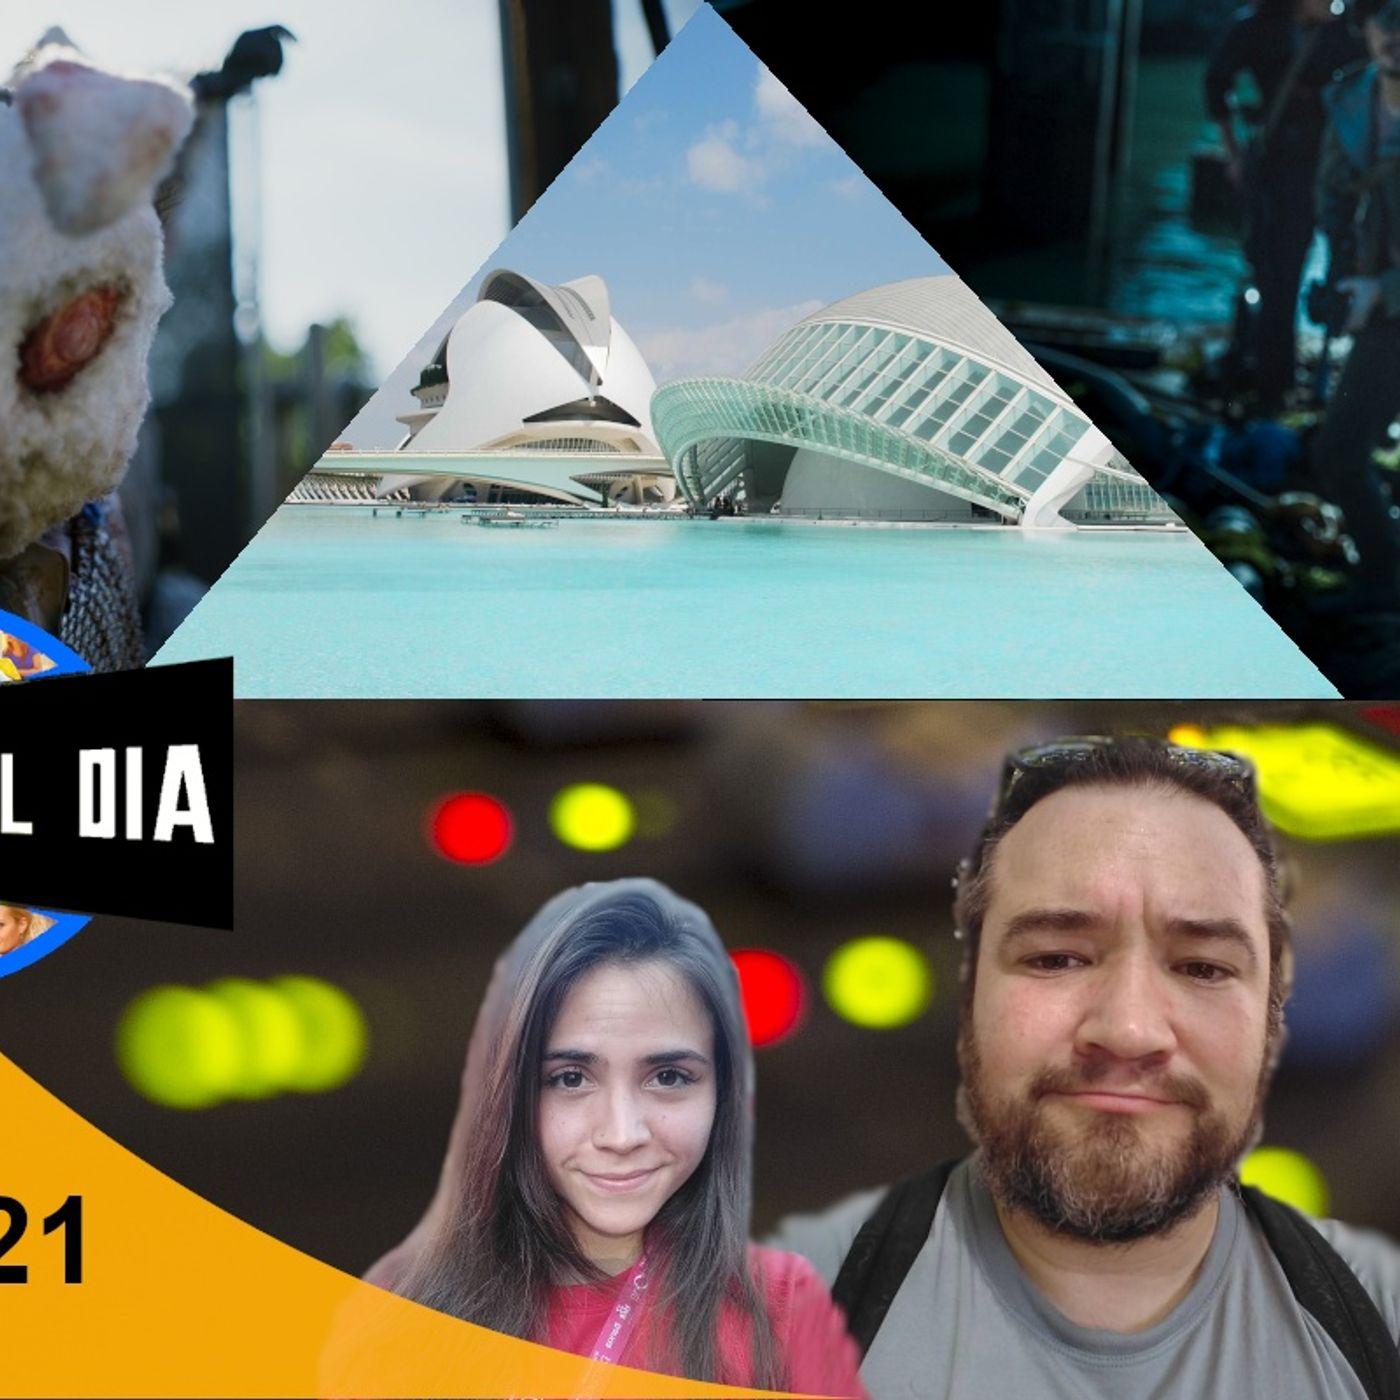 Each and every day | Ponte al día 451 (17/05/21)